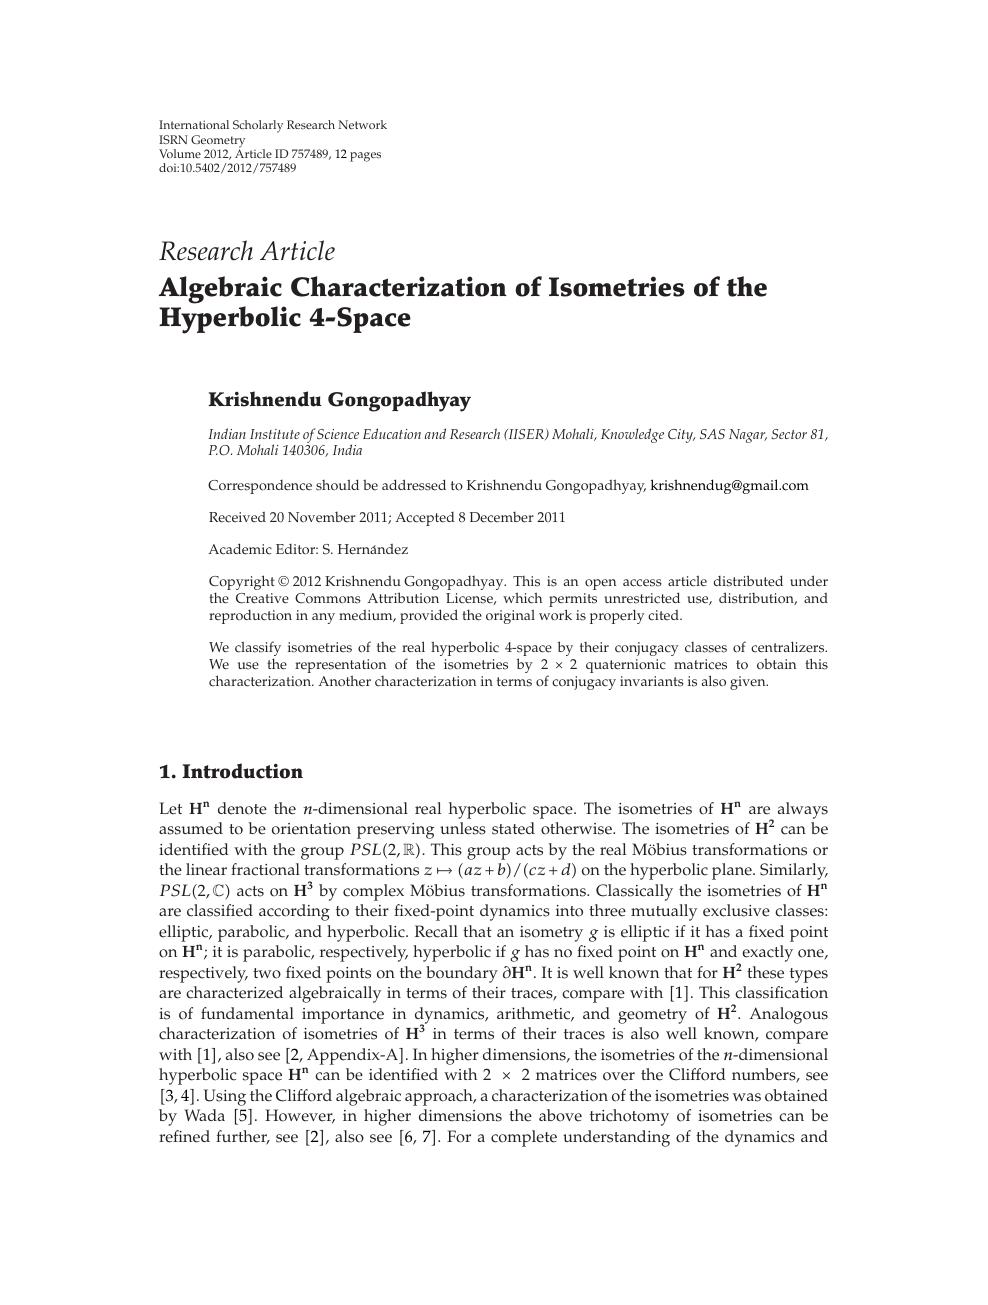 Algebraic Characterization of Isometries of the Hyperbolic 4-Space